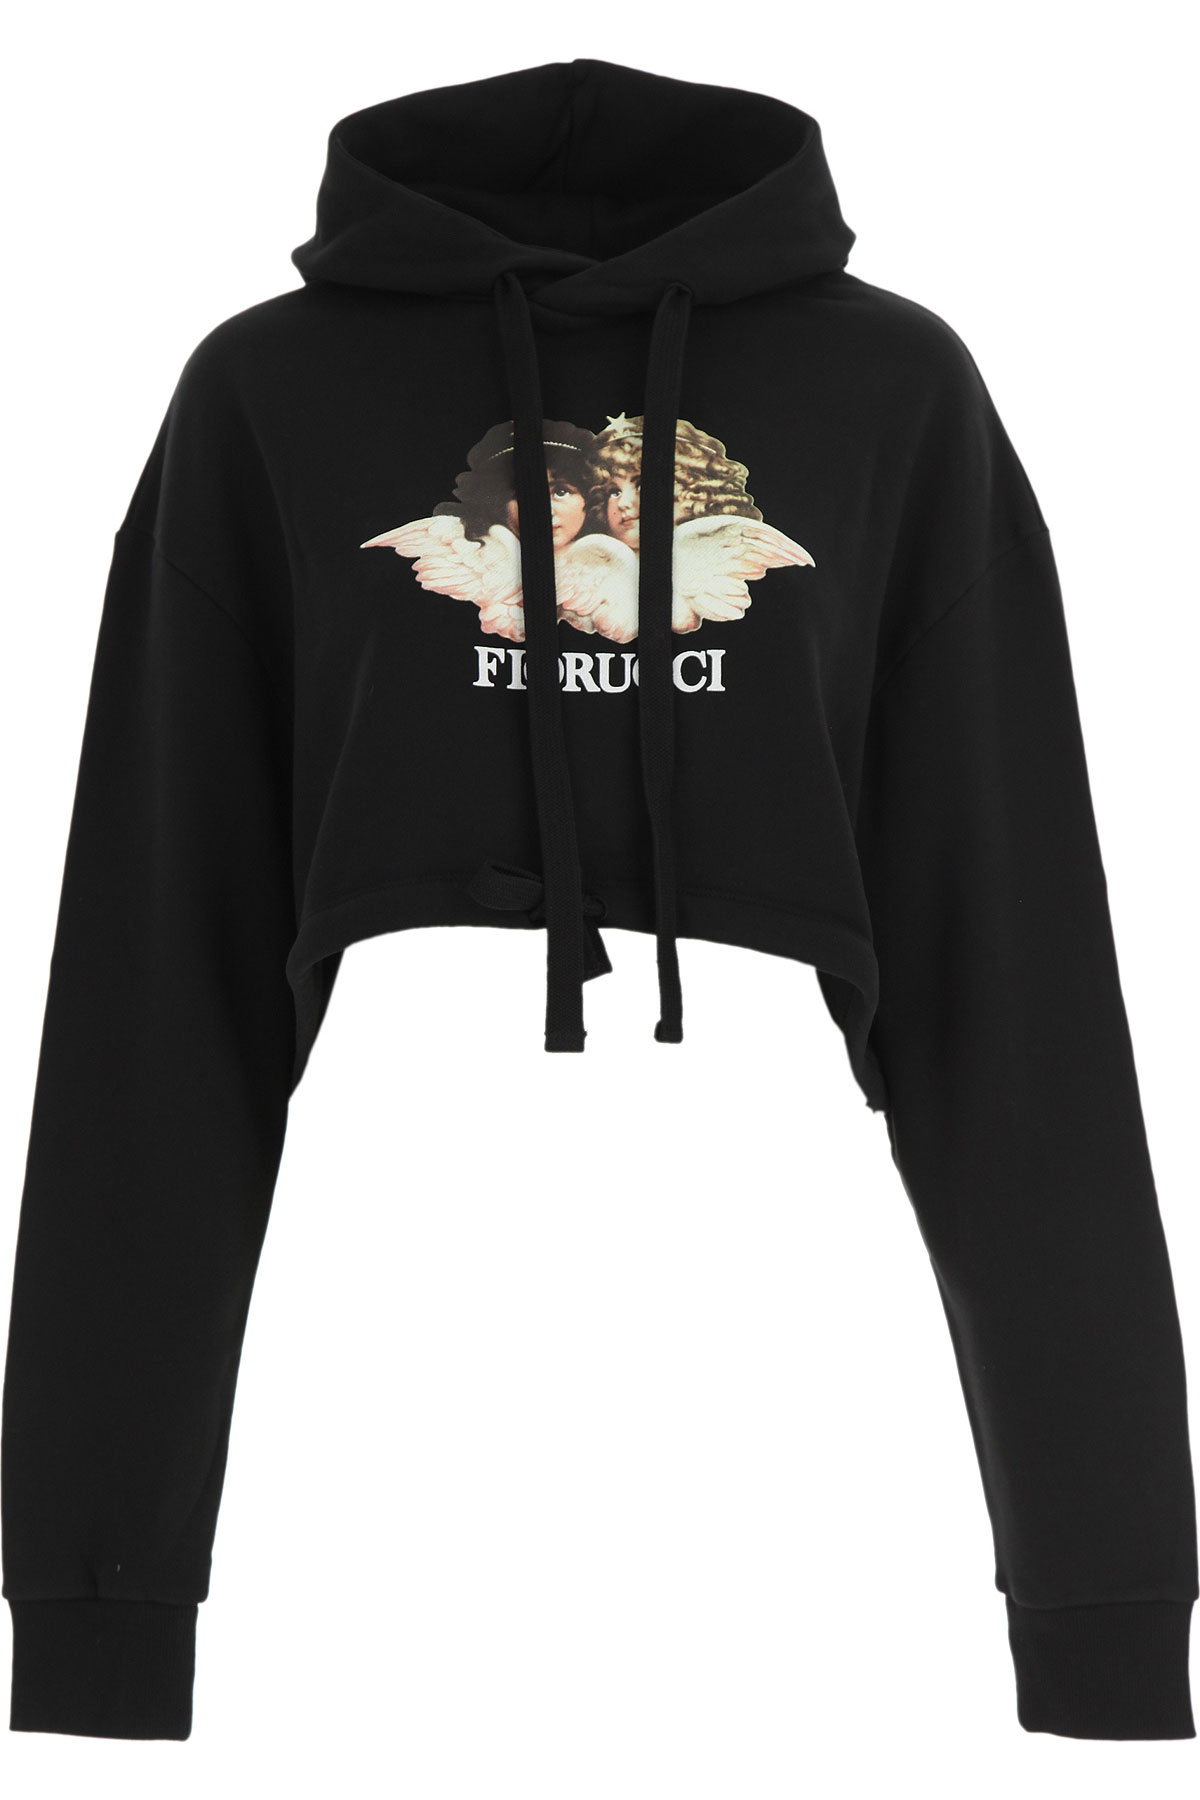 Fiorucci Sweatshirt for Women On Sale, Black, Cotton, 2019, 2 4 6